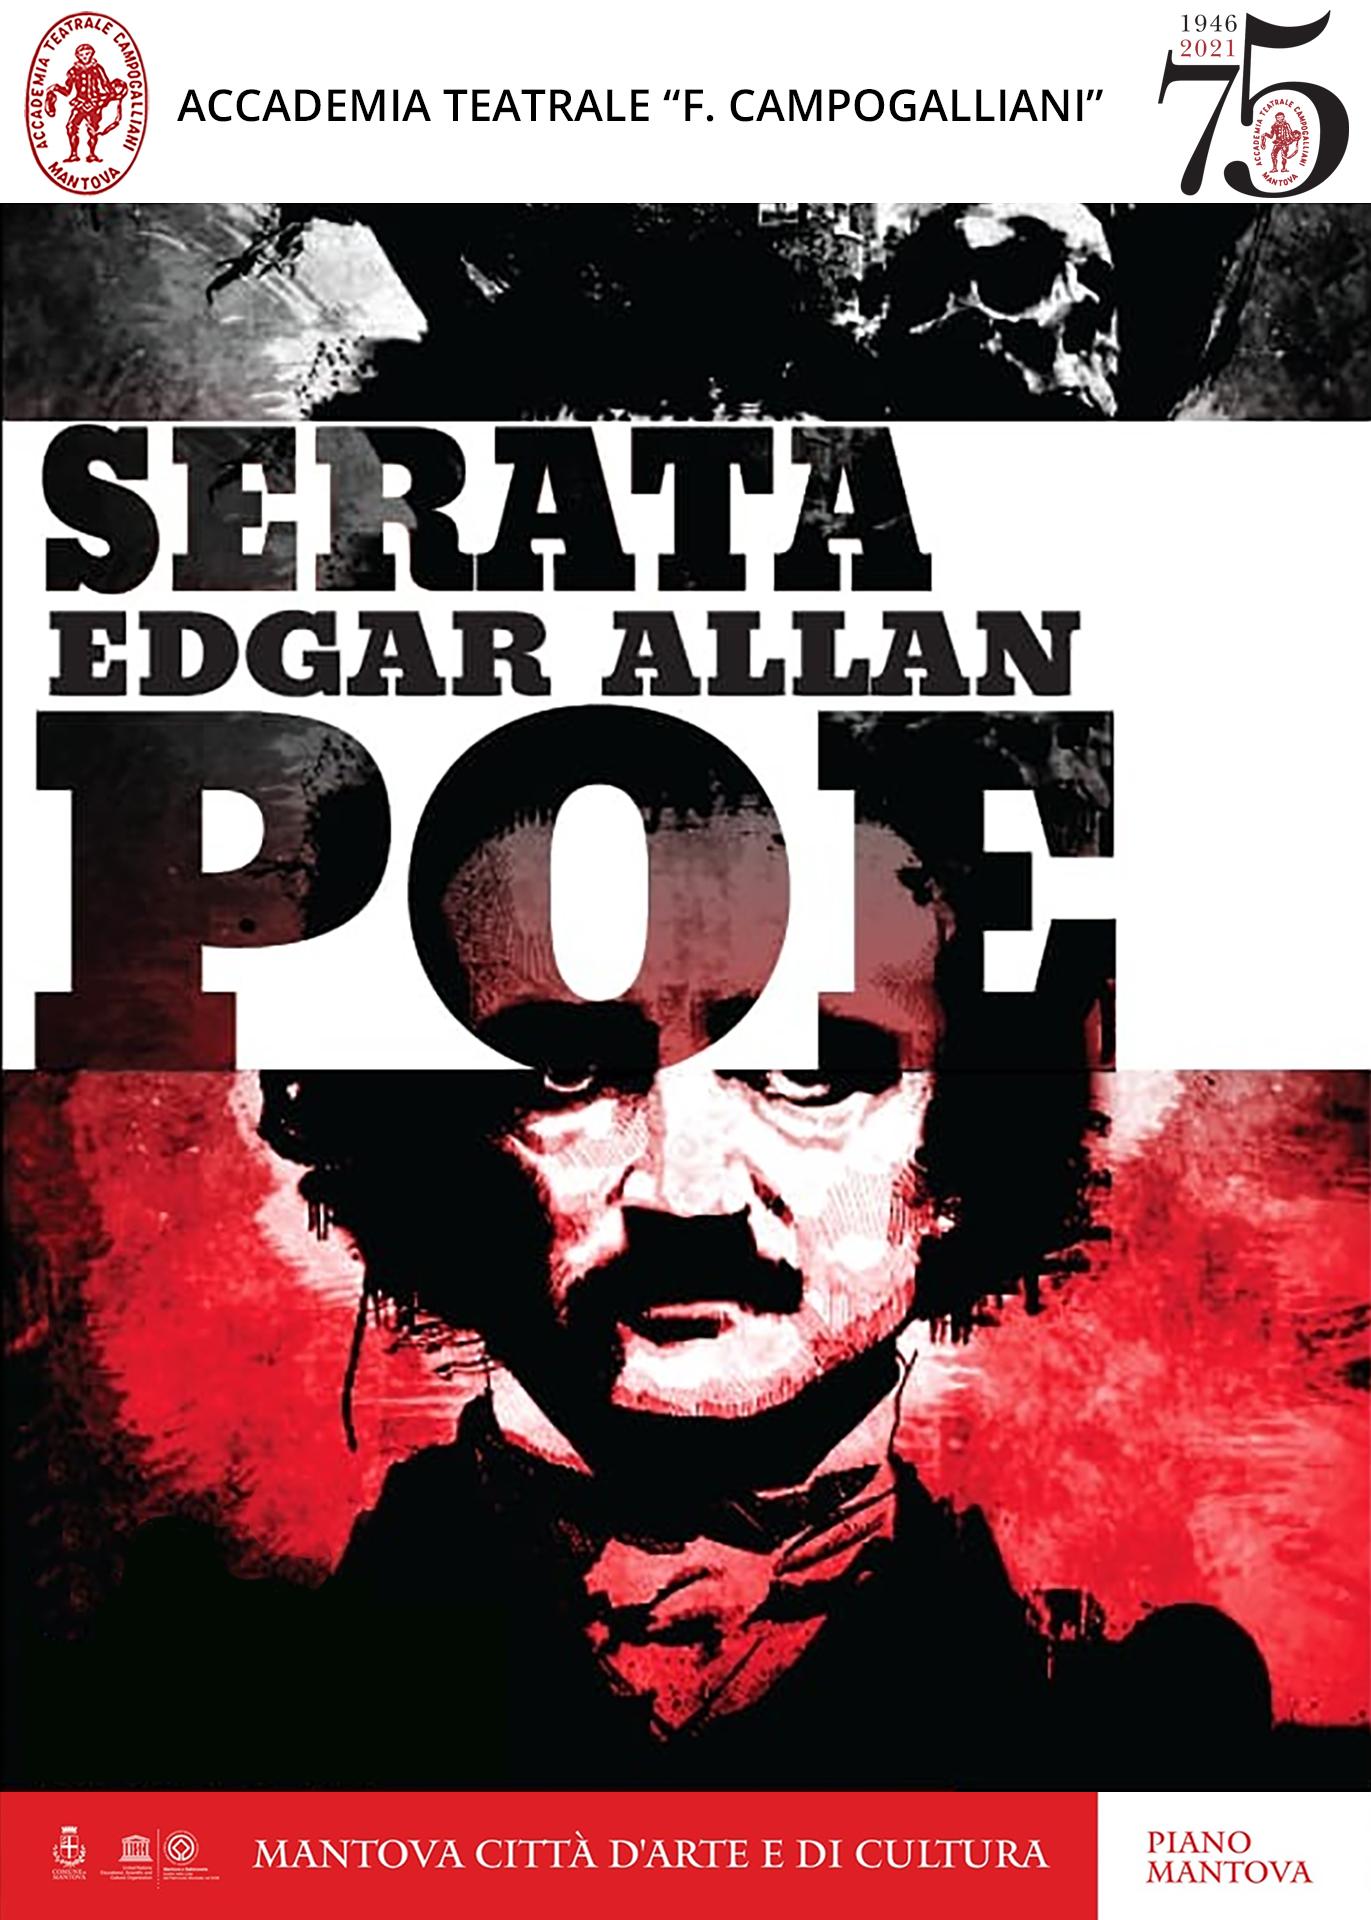 Serata Edgar Allan Poe